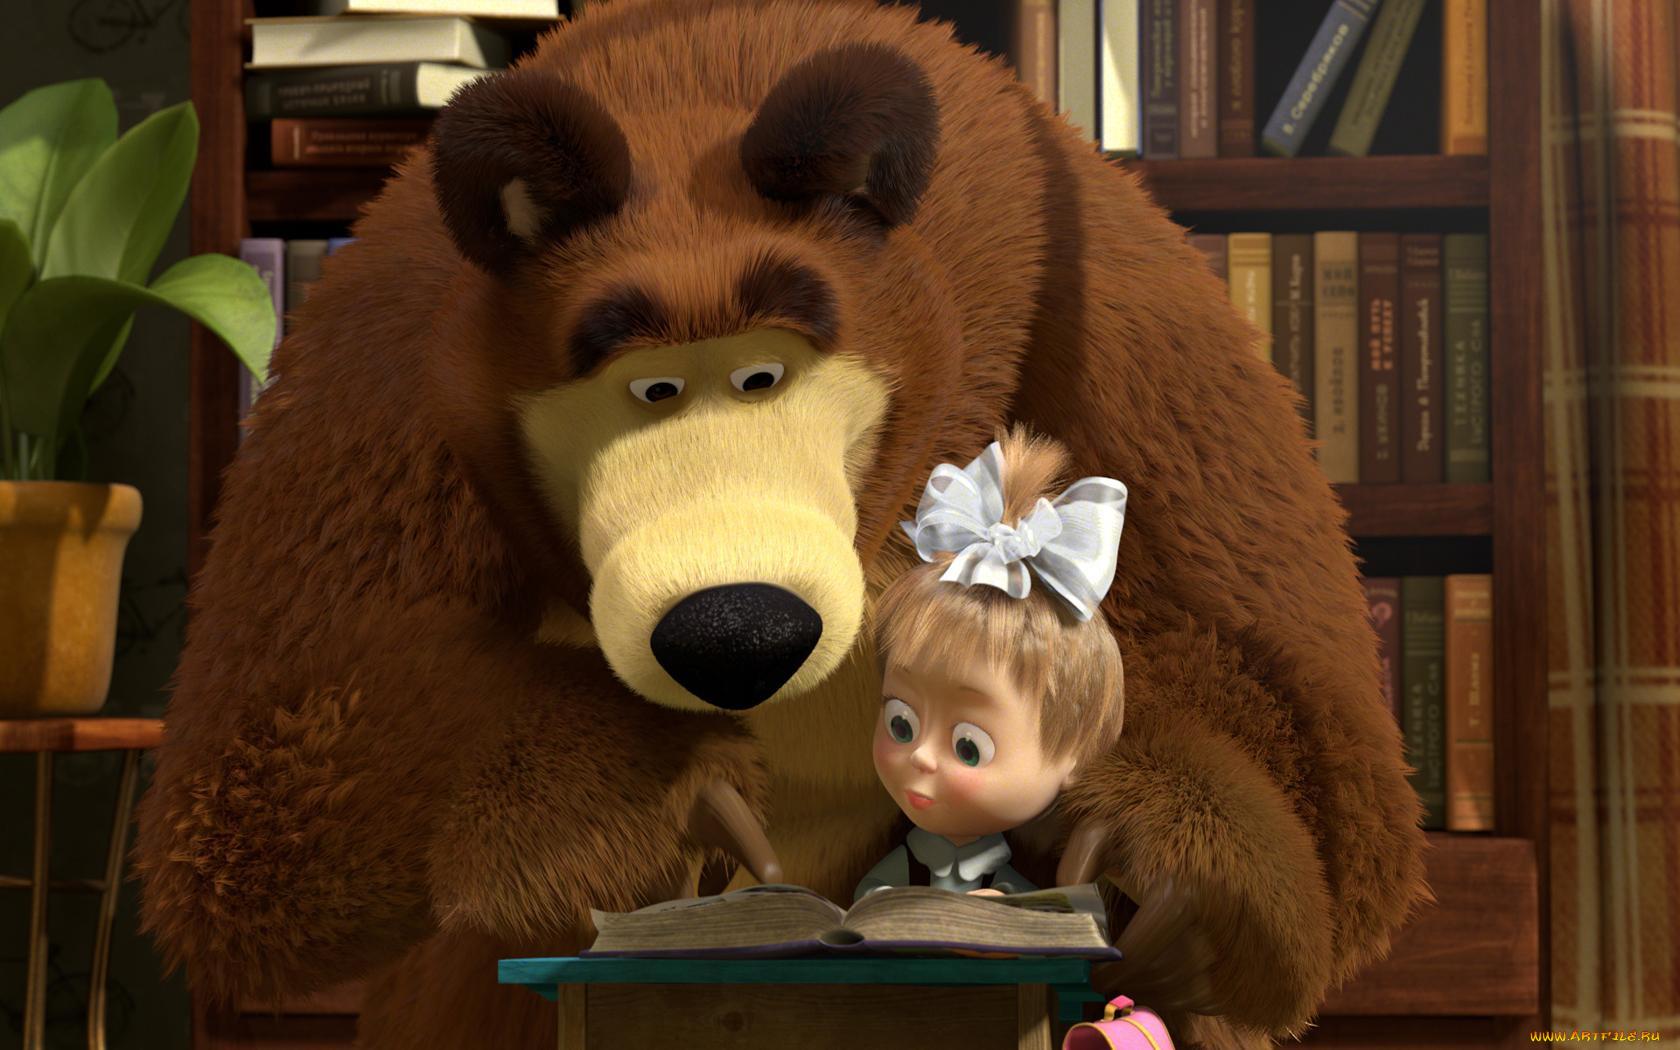 Картинки год, открытки маша и медведь все серии